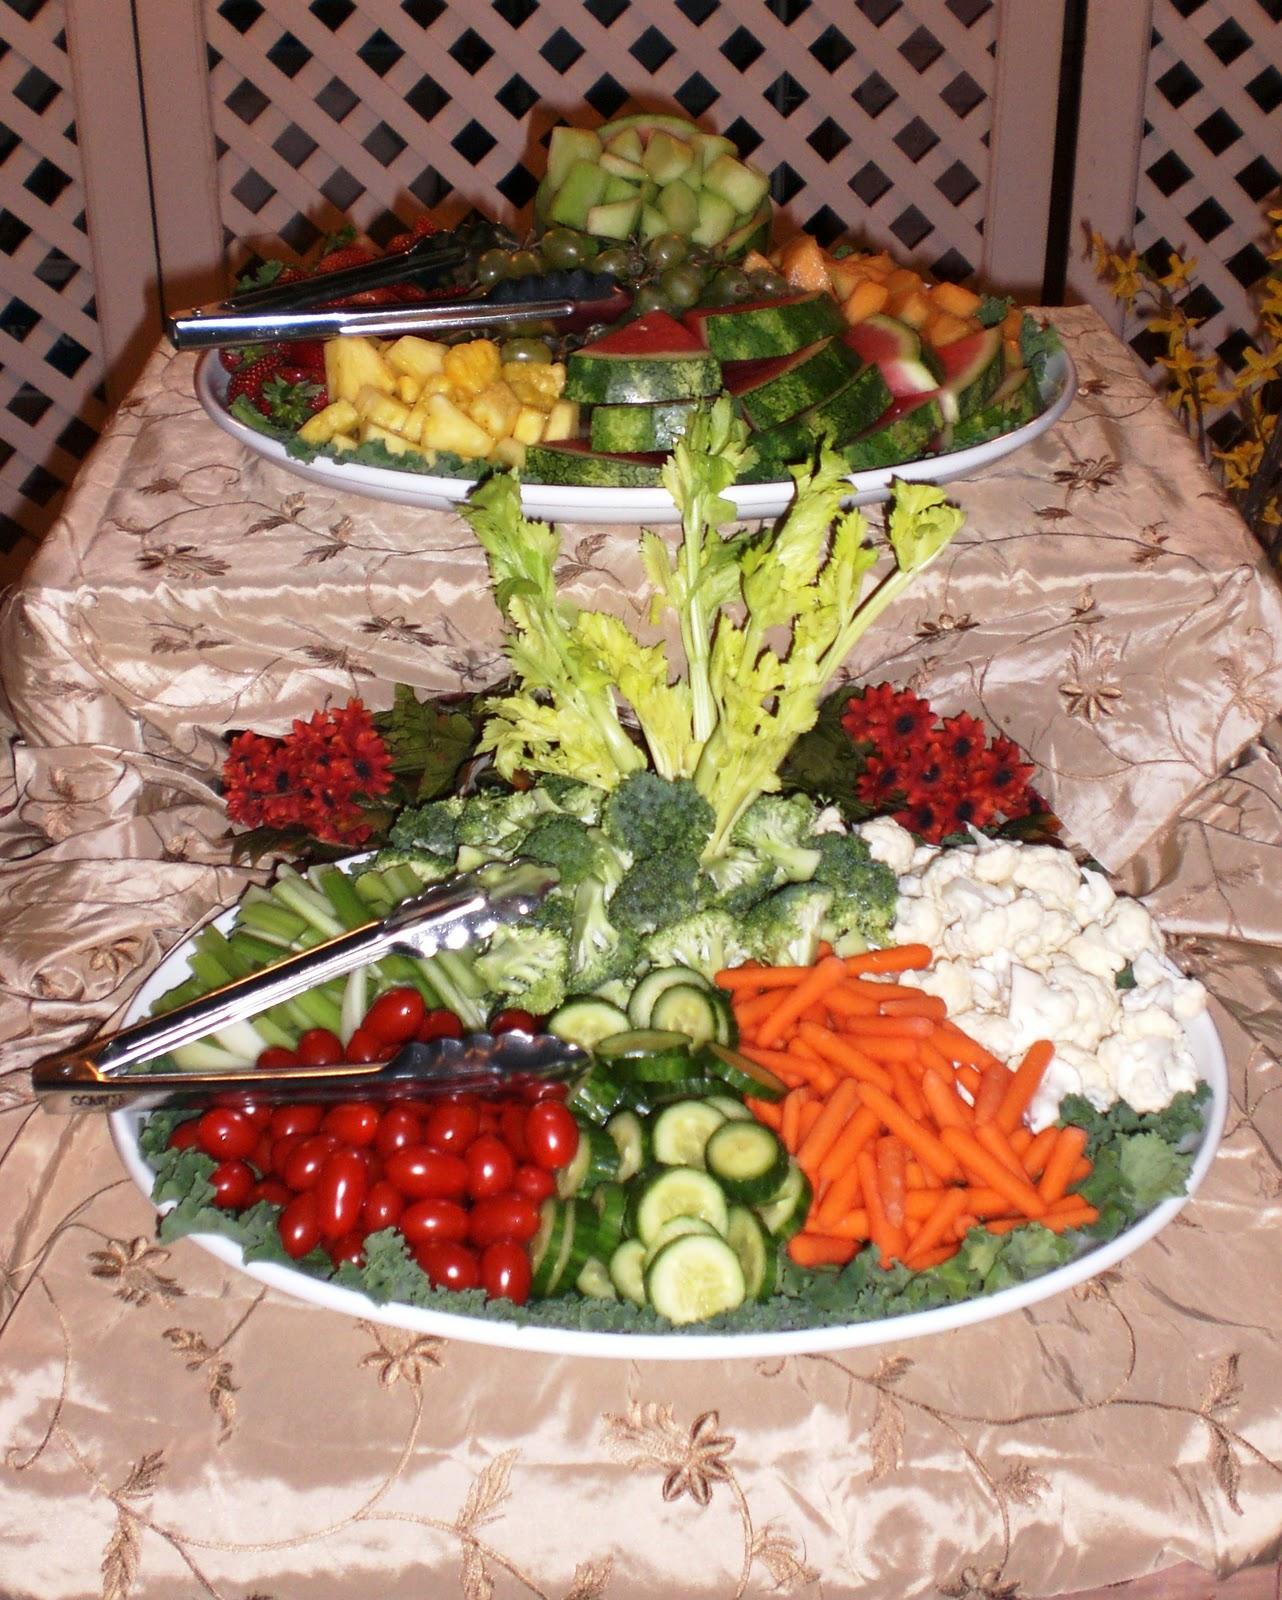 Wedding Reception Food Trays: Sassy Stripes Catering